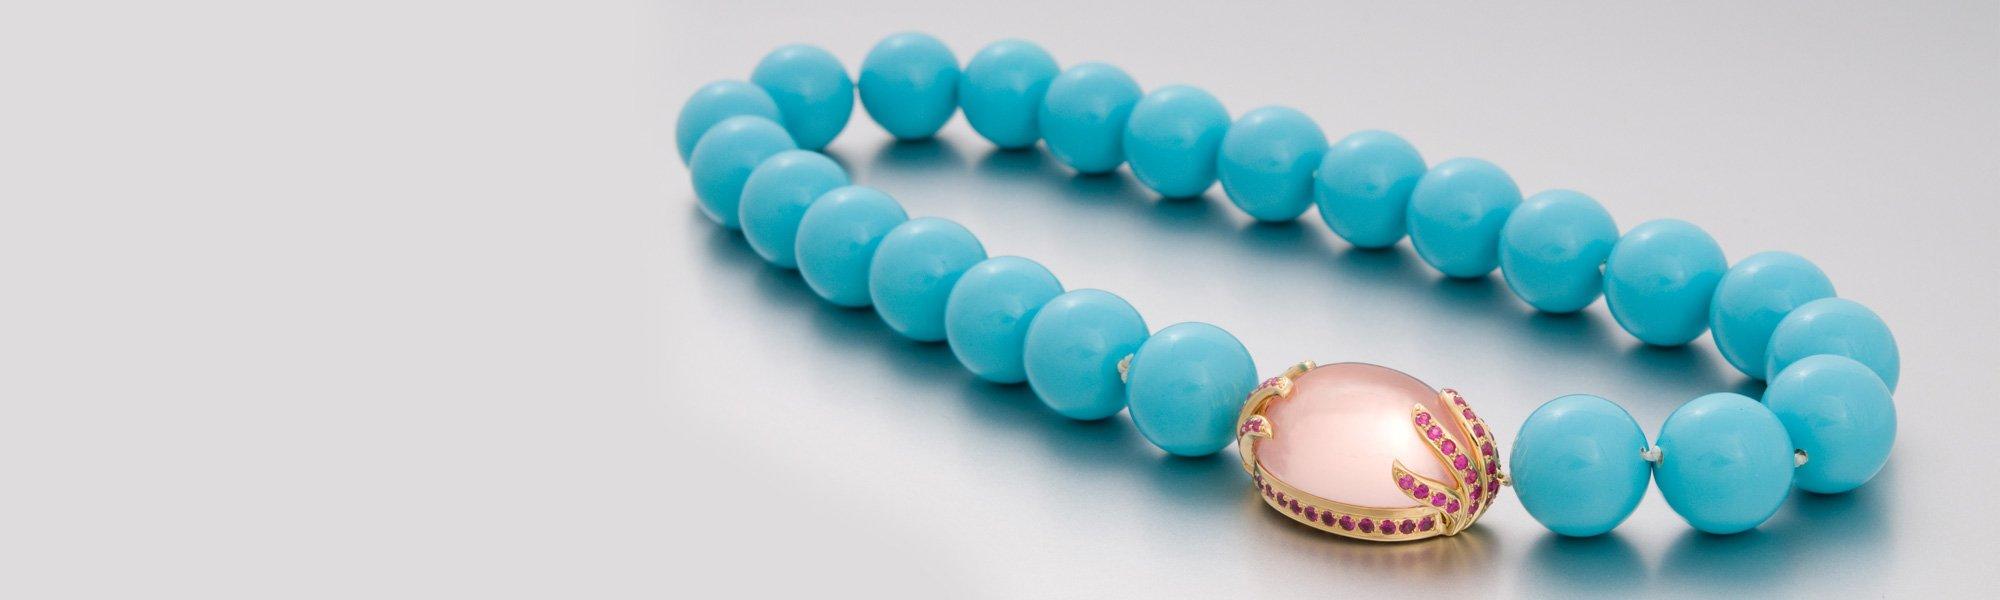 mara-hotung-blue-bead-necklace